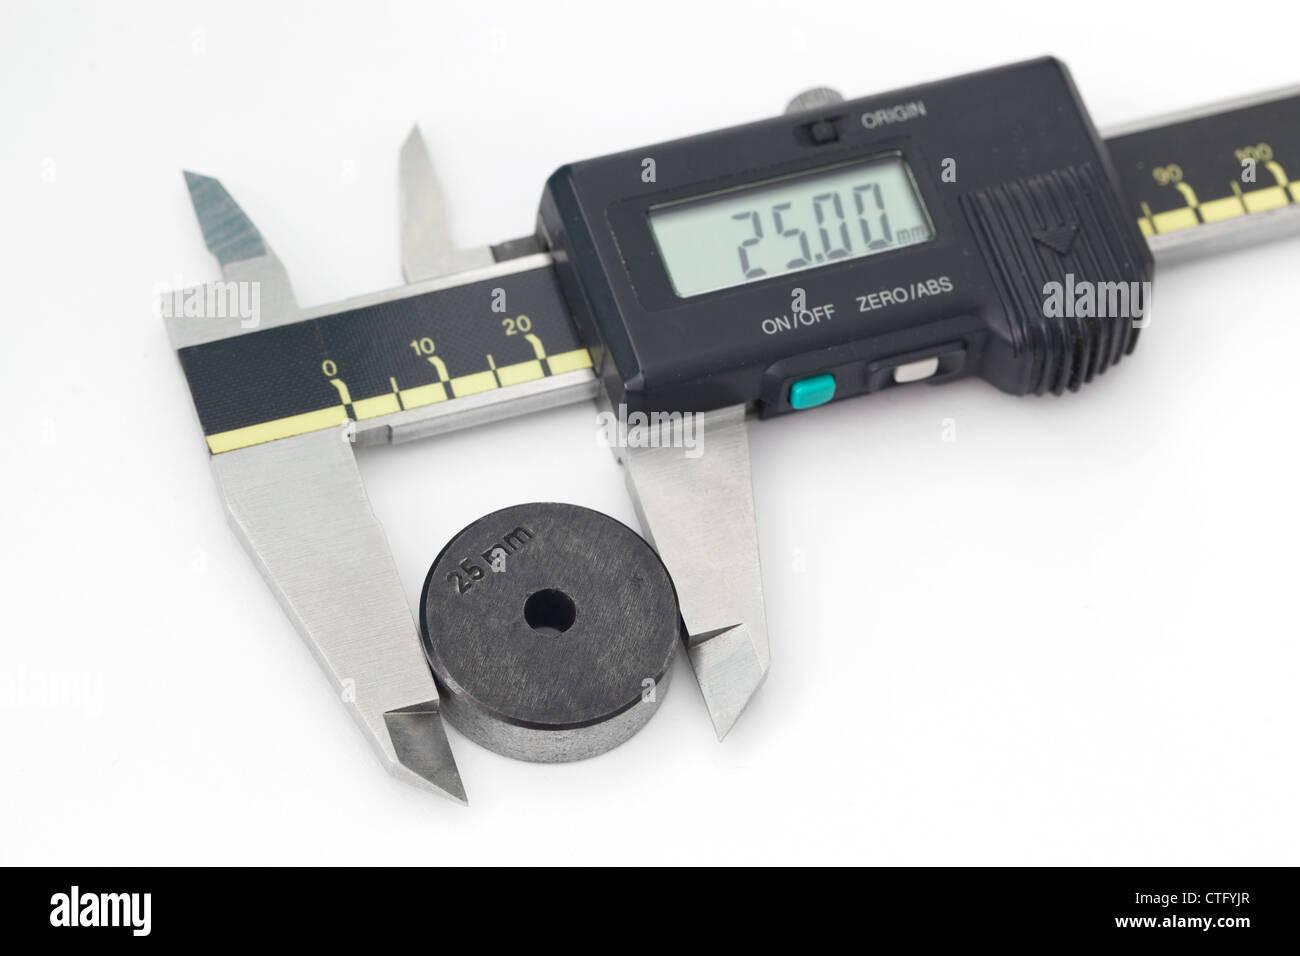 Digital Caliper - Stock Image